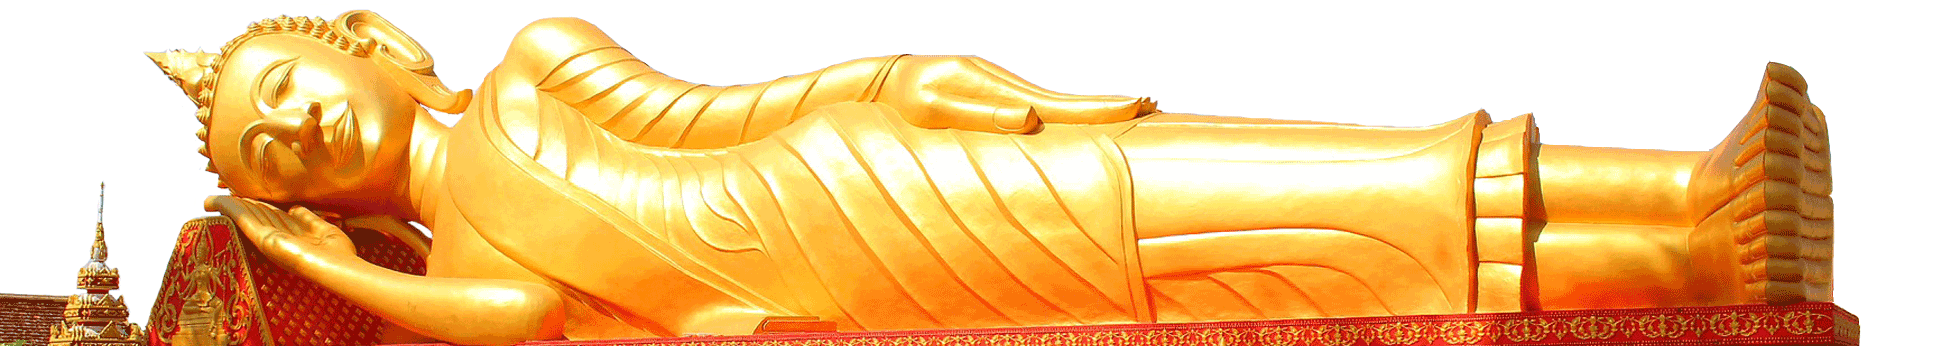 buddha couché Laos